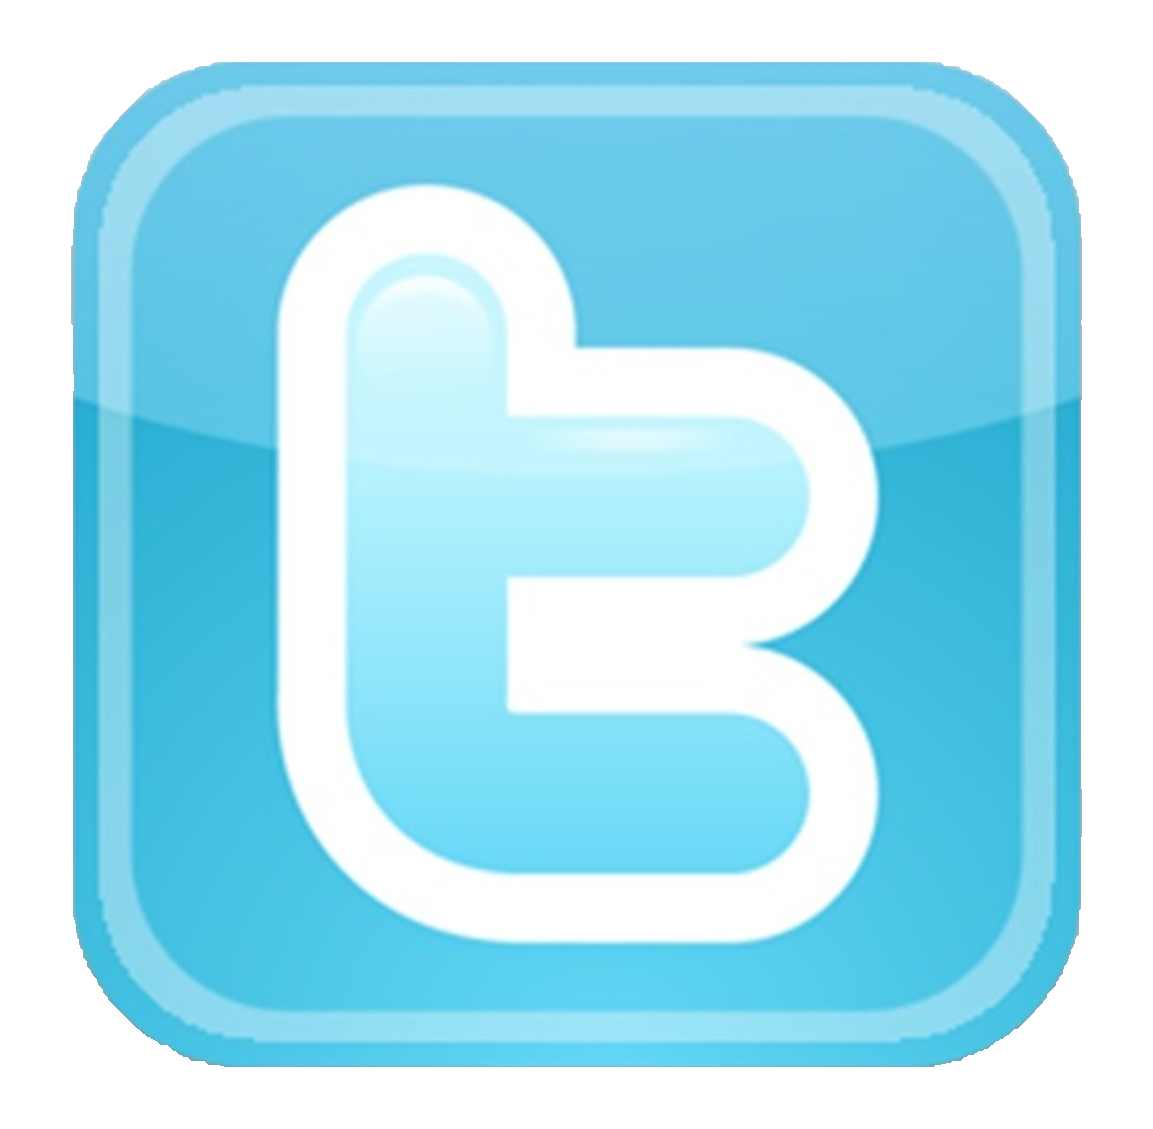 6twitter_logo.png